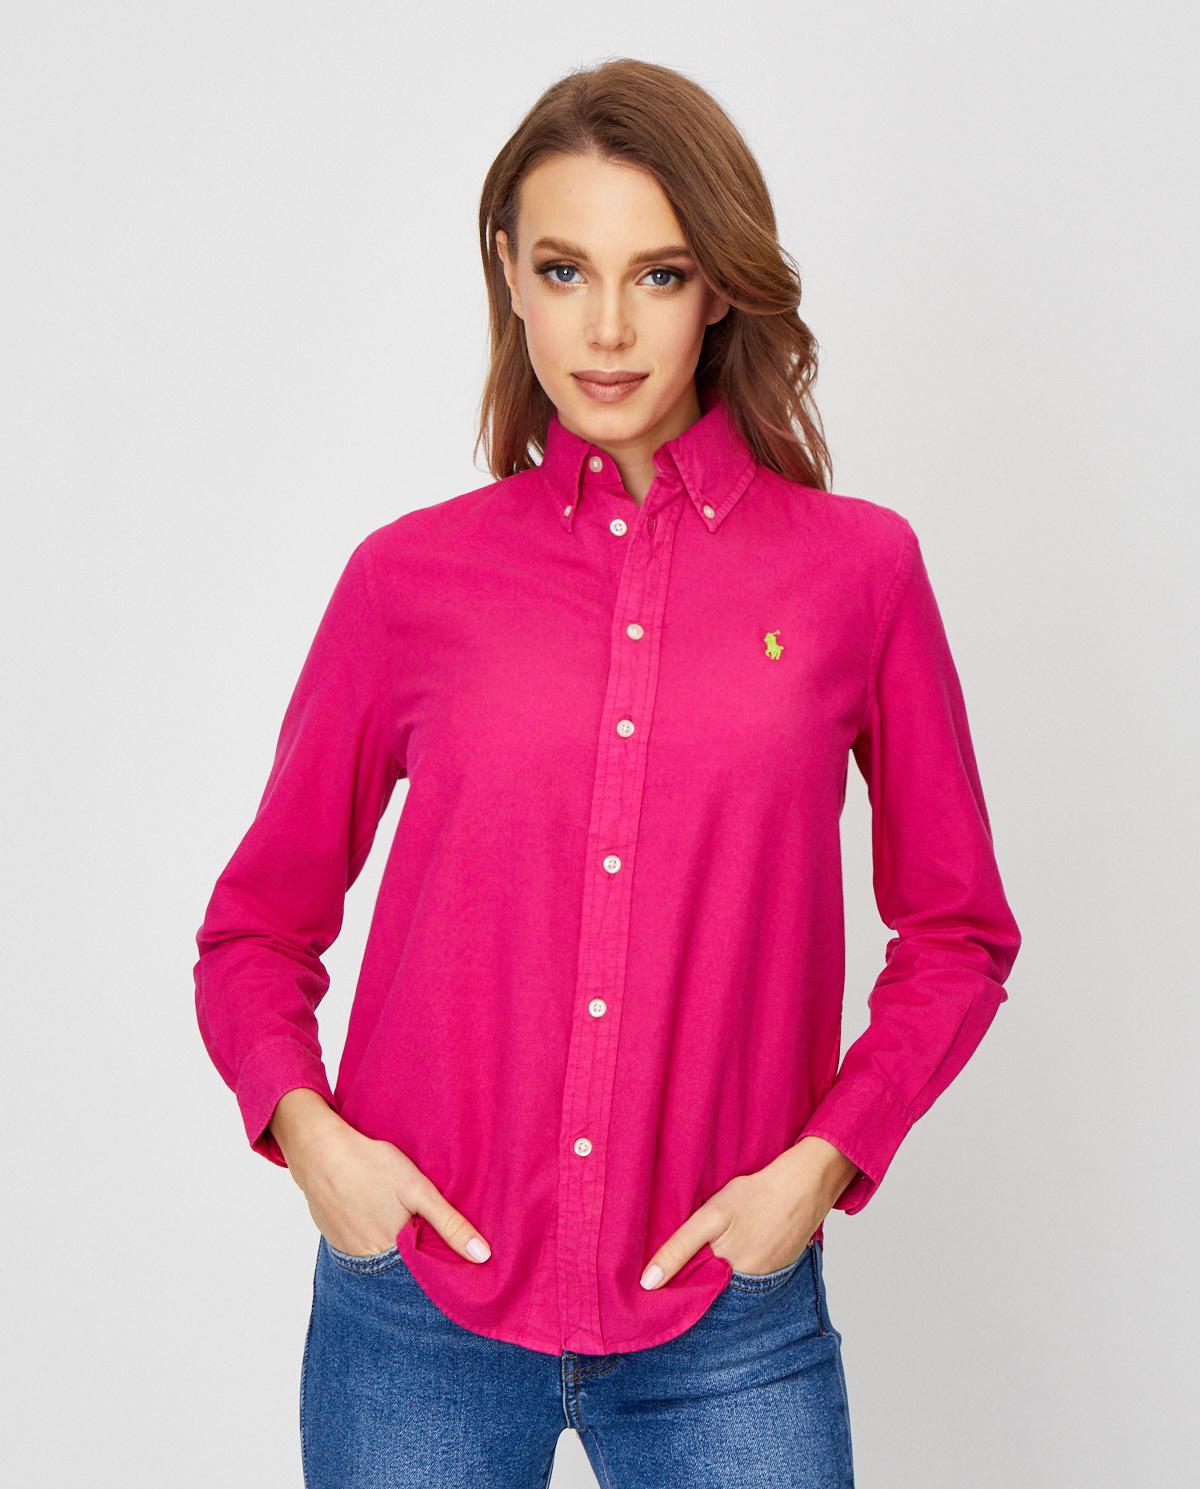 Damska różowa koszula z bawełny Relaxed Fit Polo Ralph Lauren 211780679001